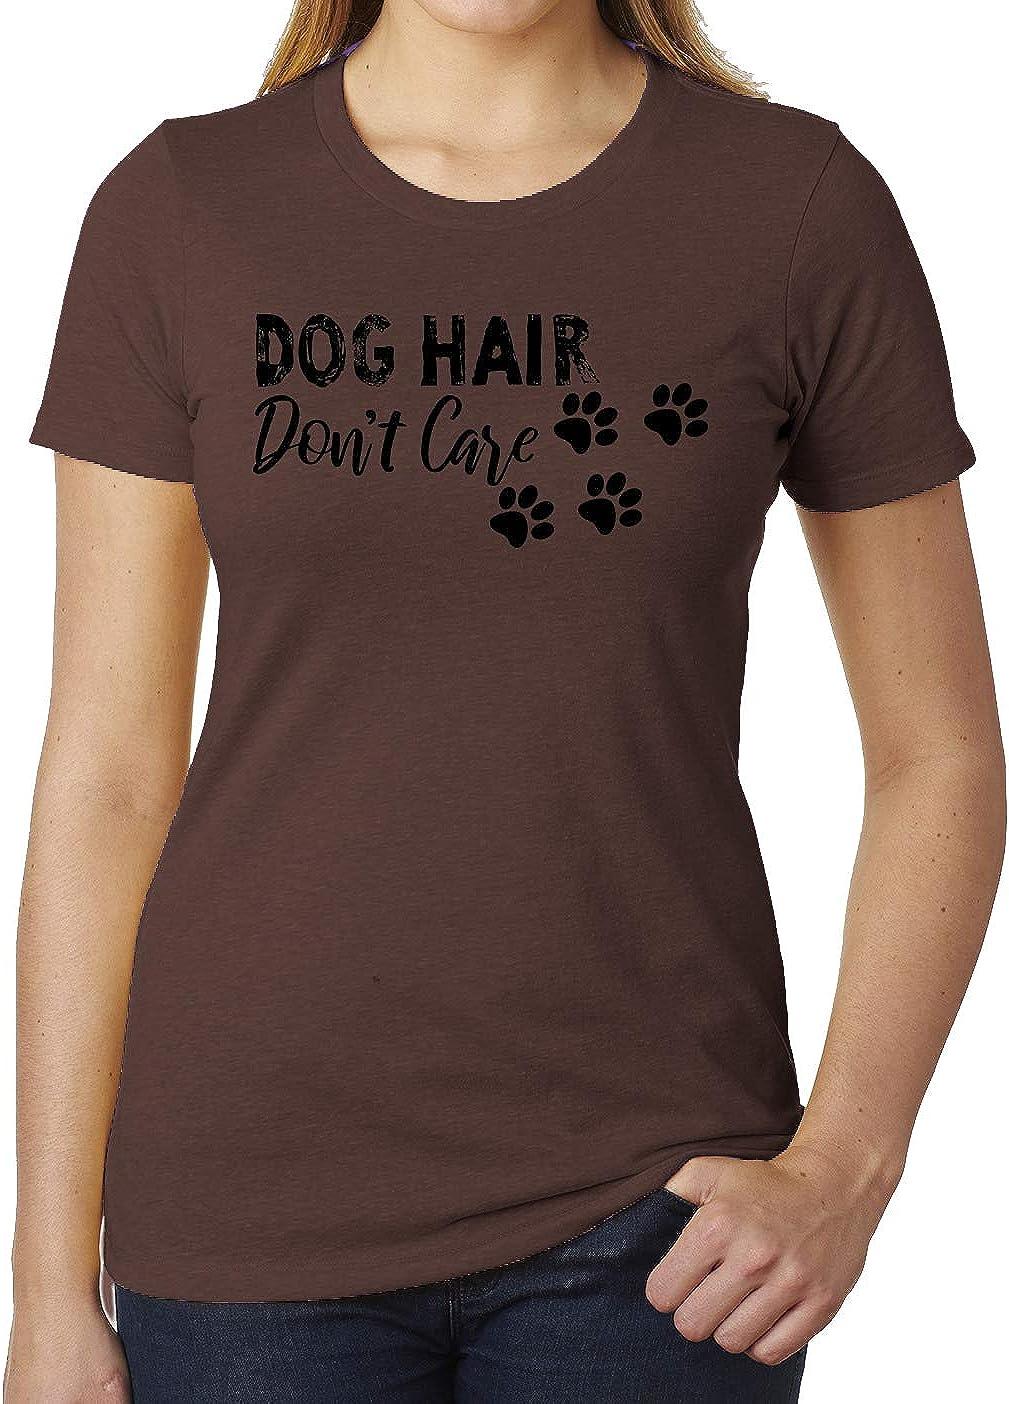 Mato & Hash Dog Hair Don't Care, Woman's Dog Shirts, Cute Graphic T-Shirts